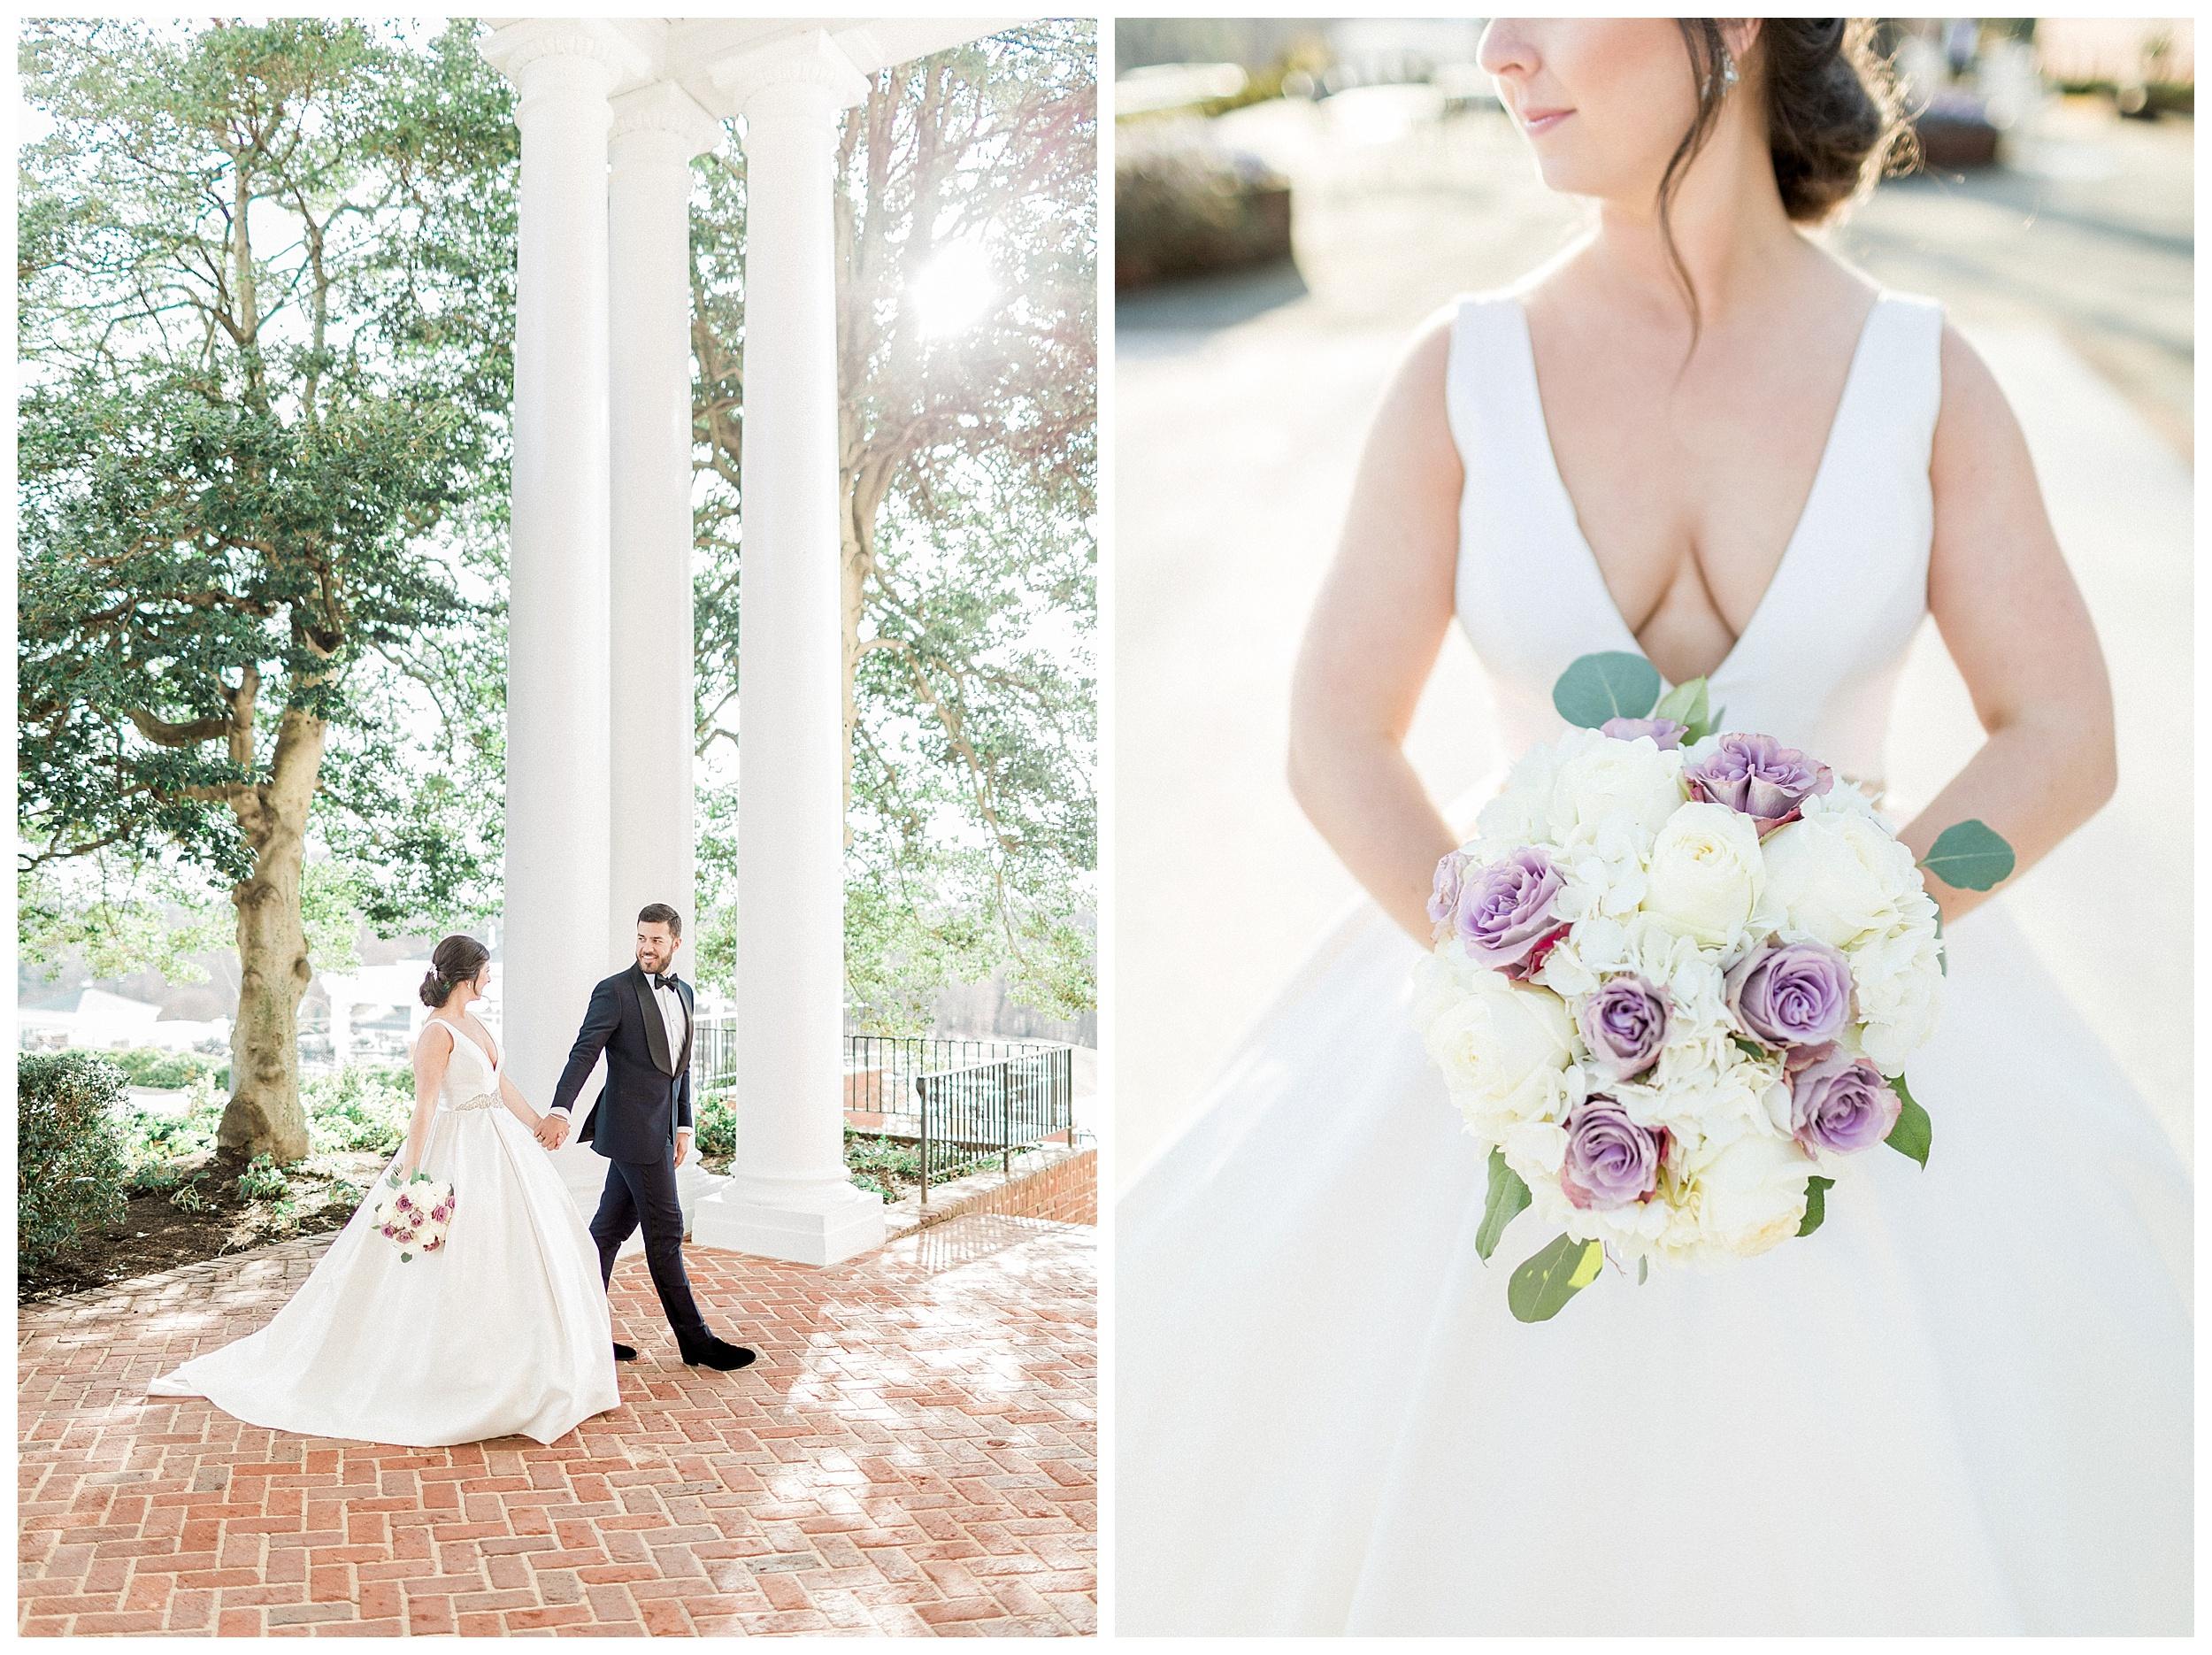 Country Club of Virginia Wedding | Richmond Wedding Photographer_0115.jpg